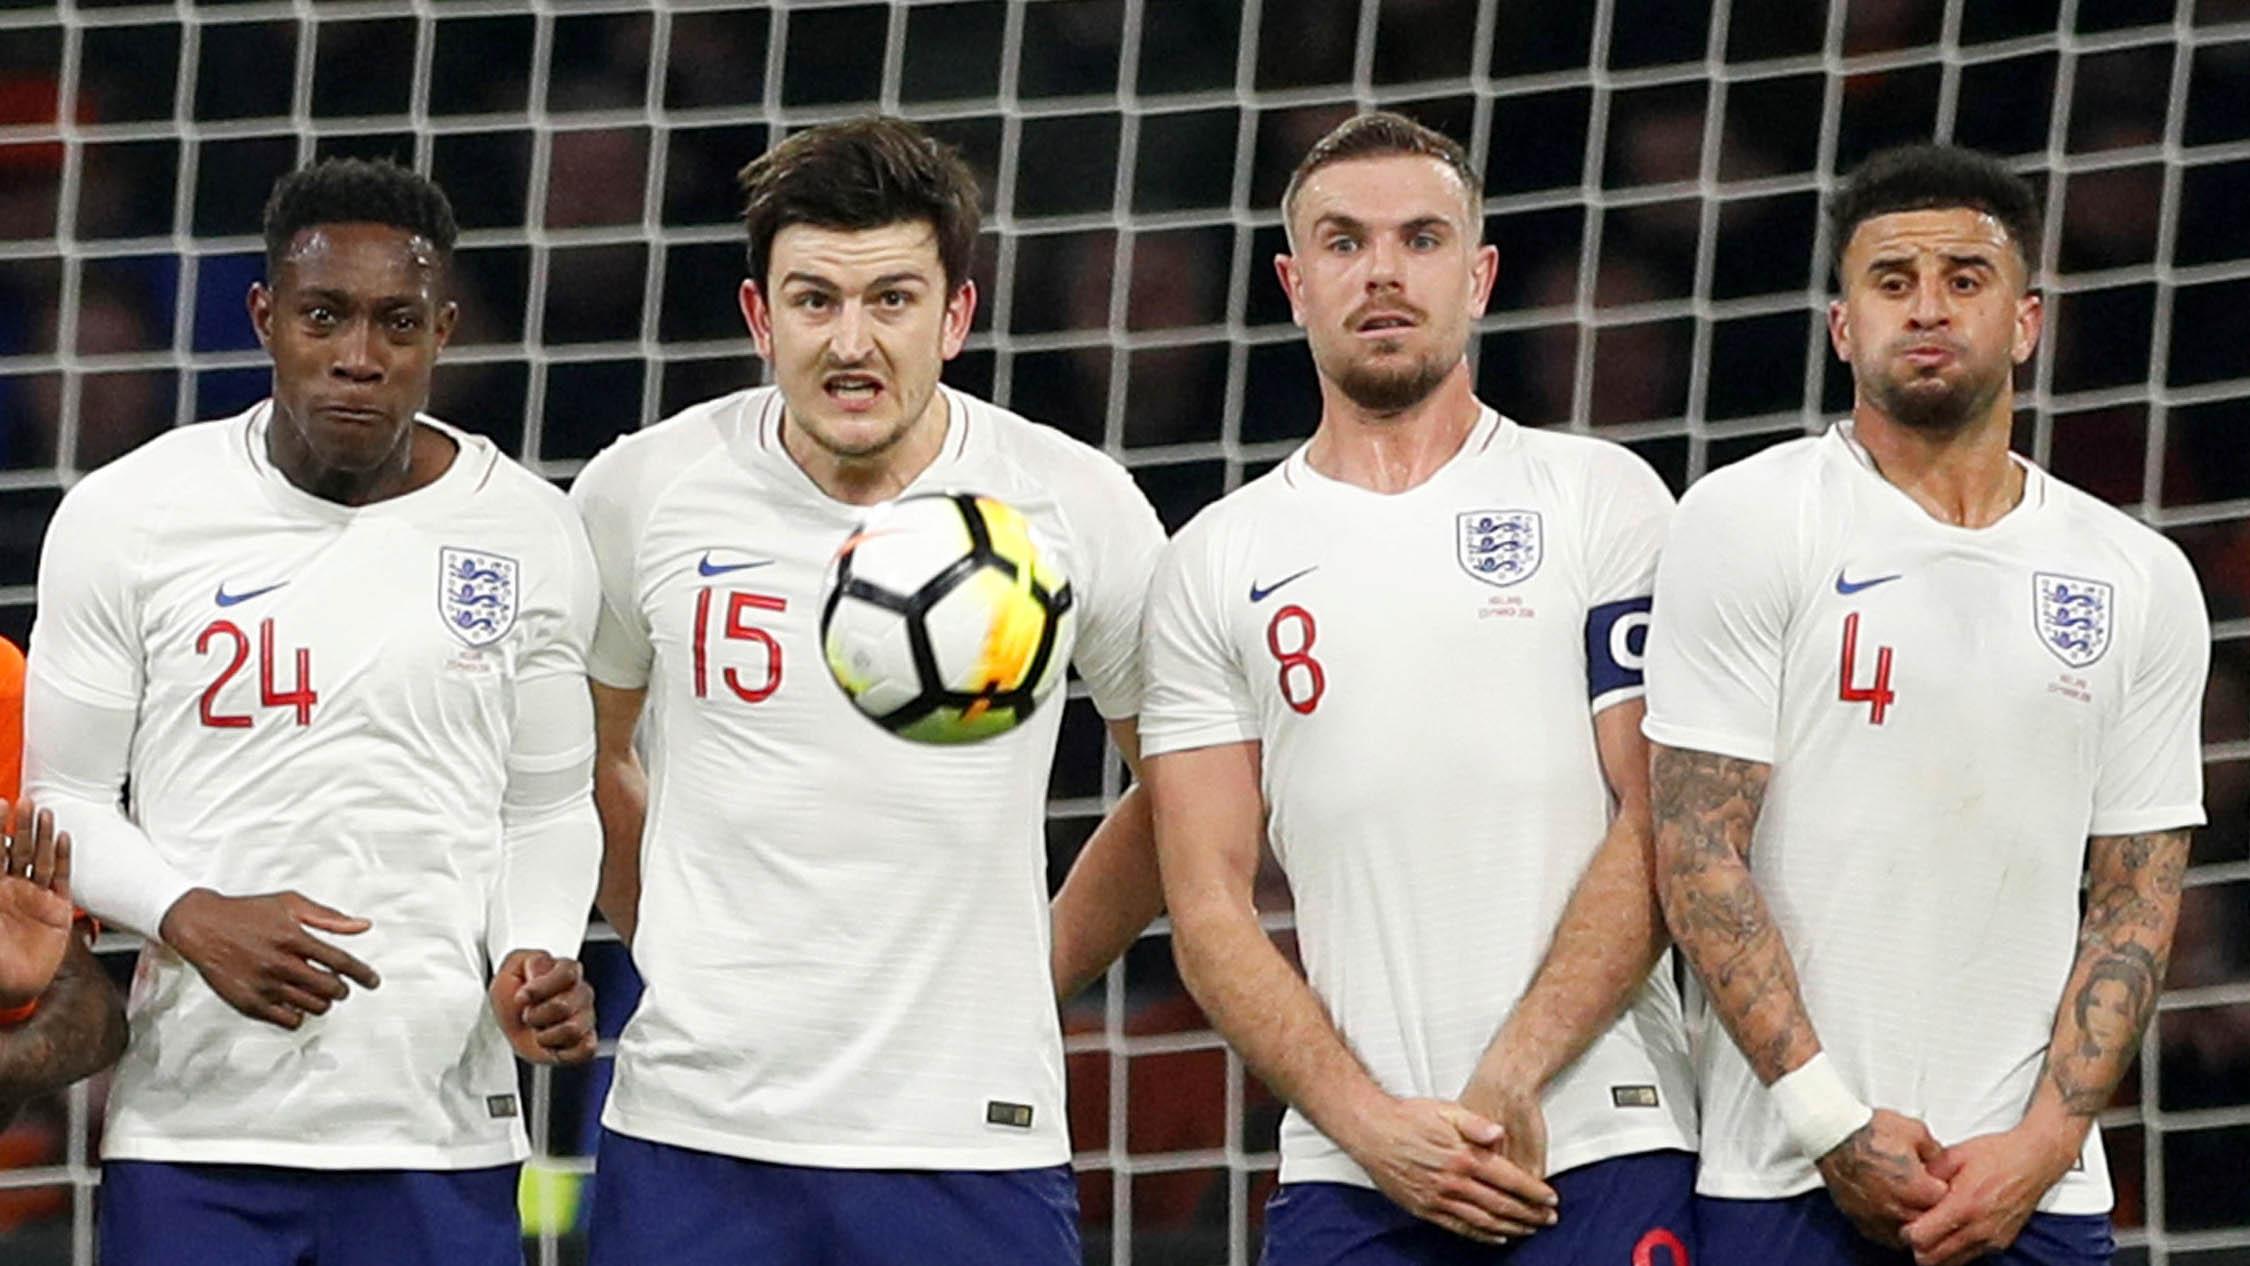 Bet on england world cup squad 103 bettington road oatlands